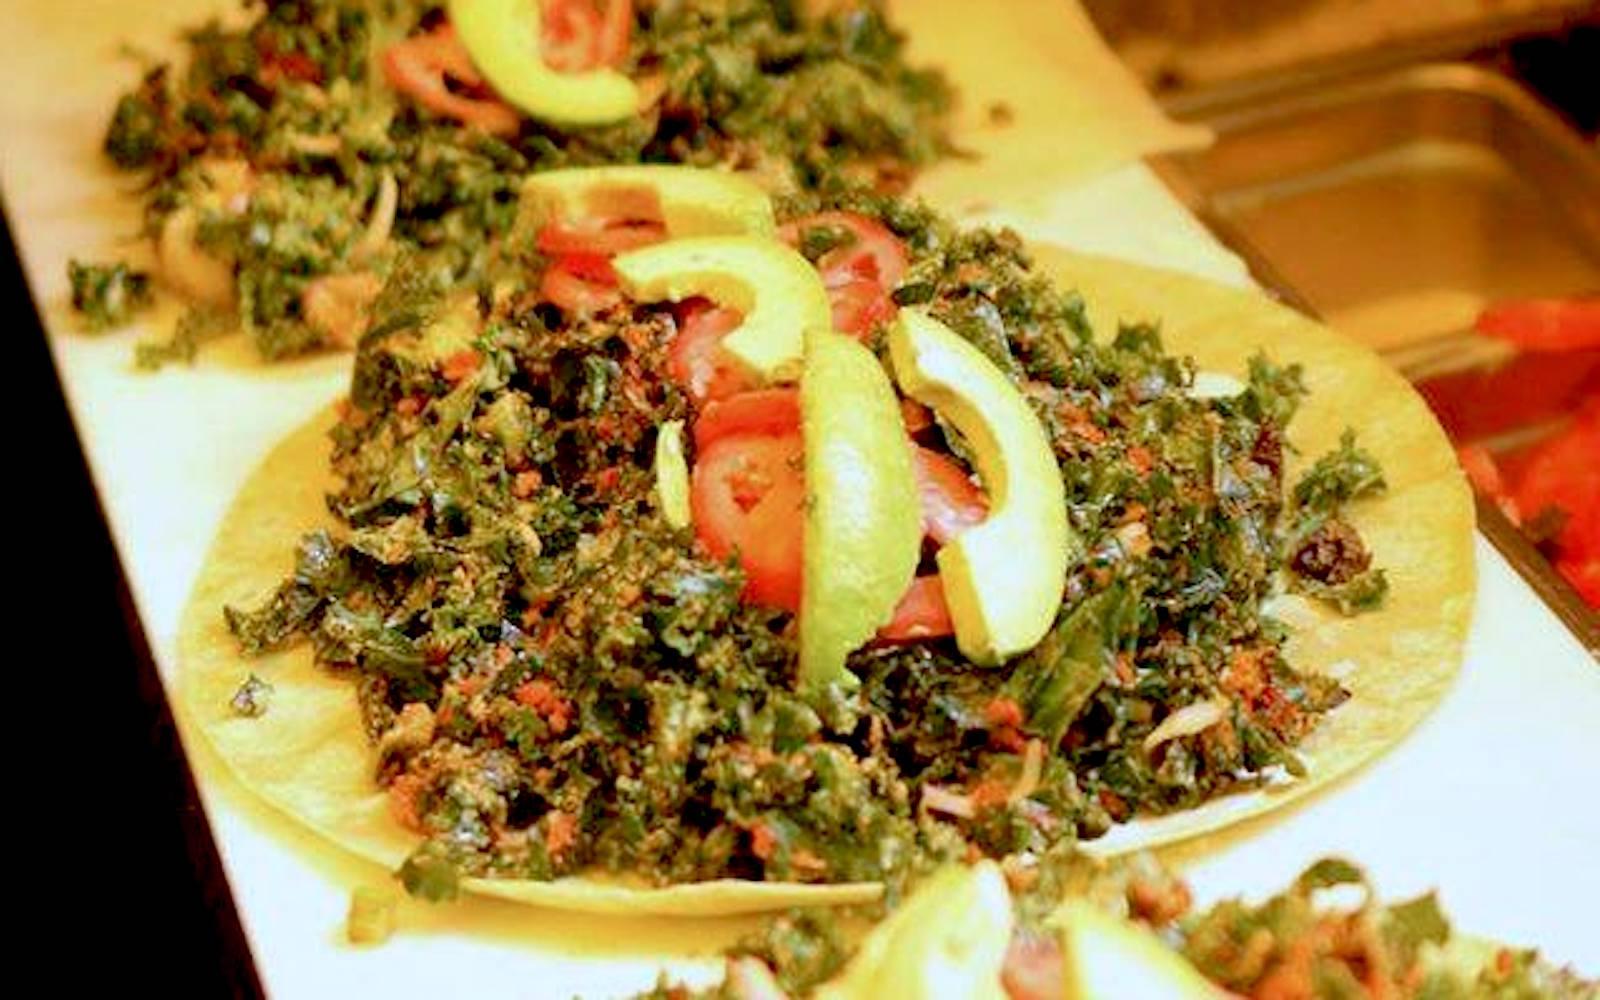 tassilis raw reality cafe vegan atlanta